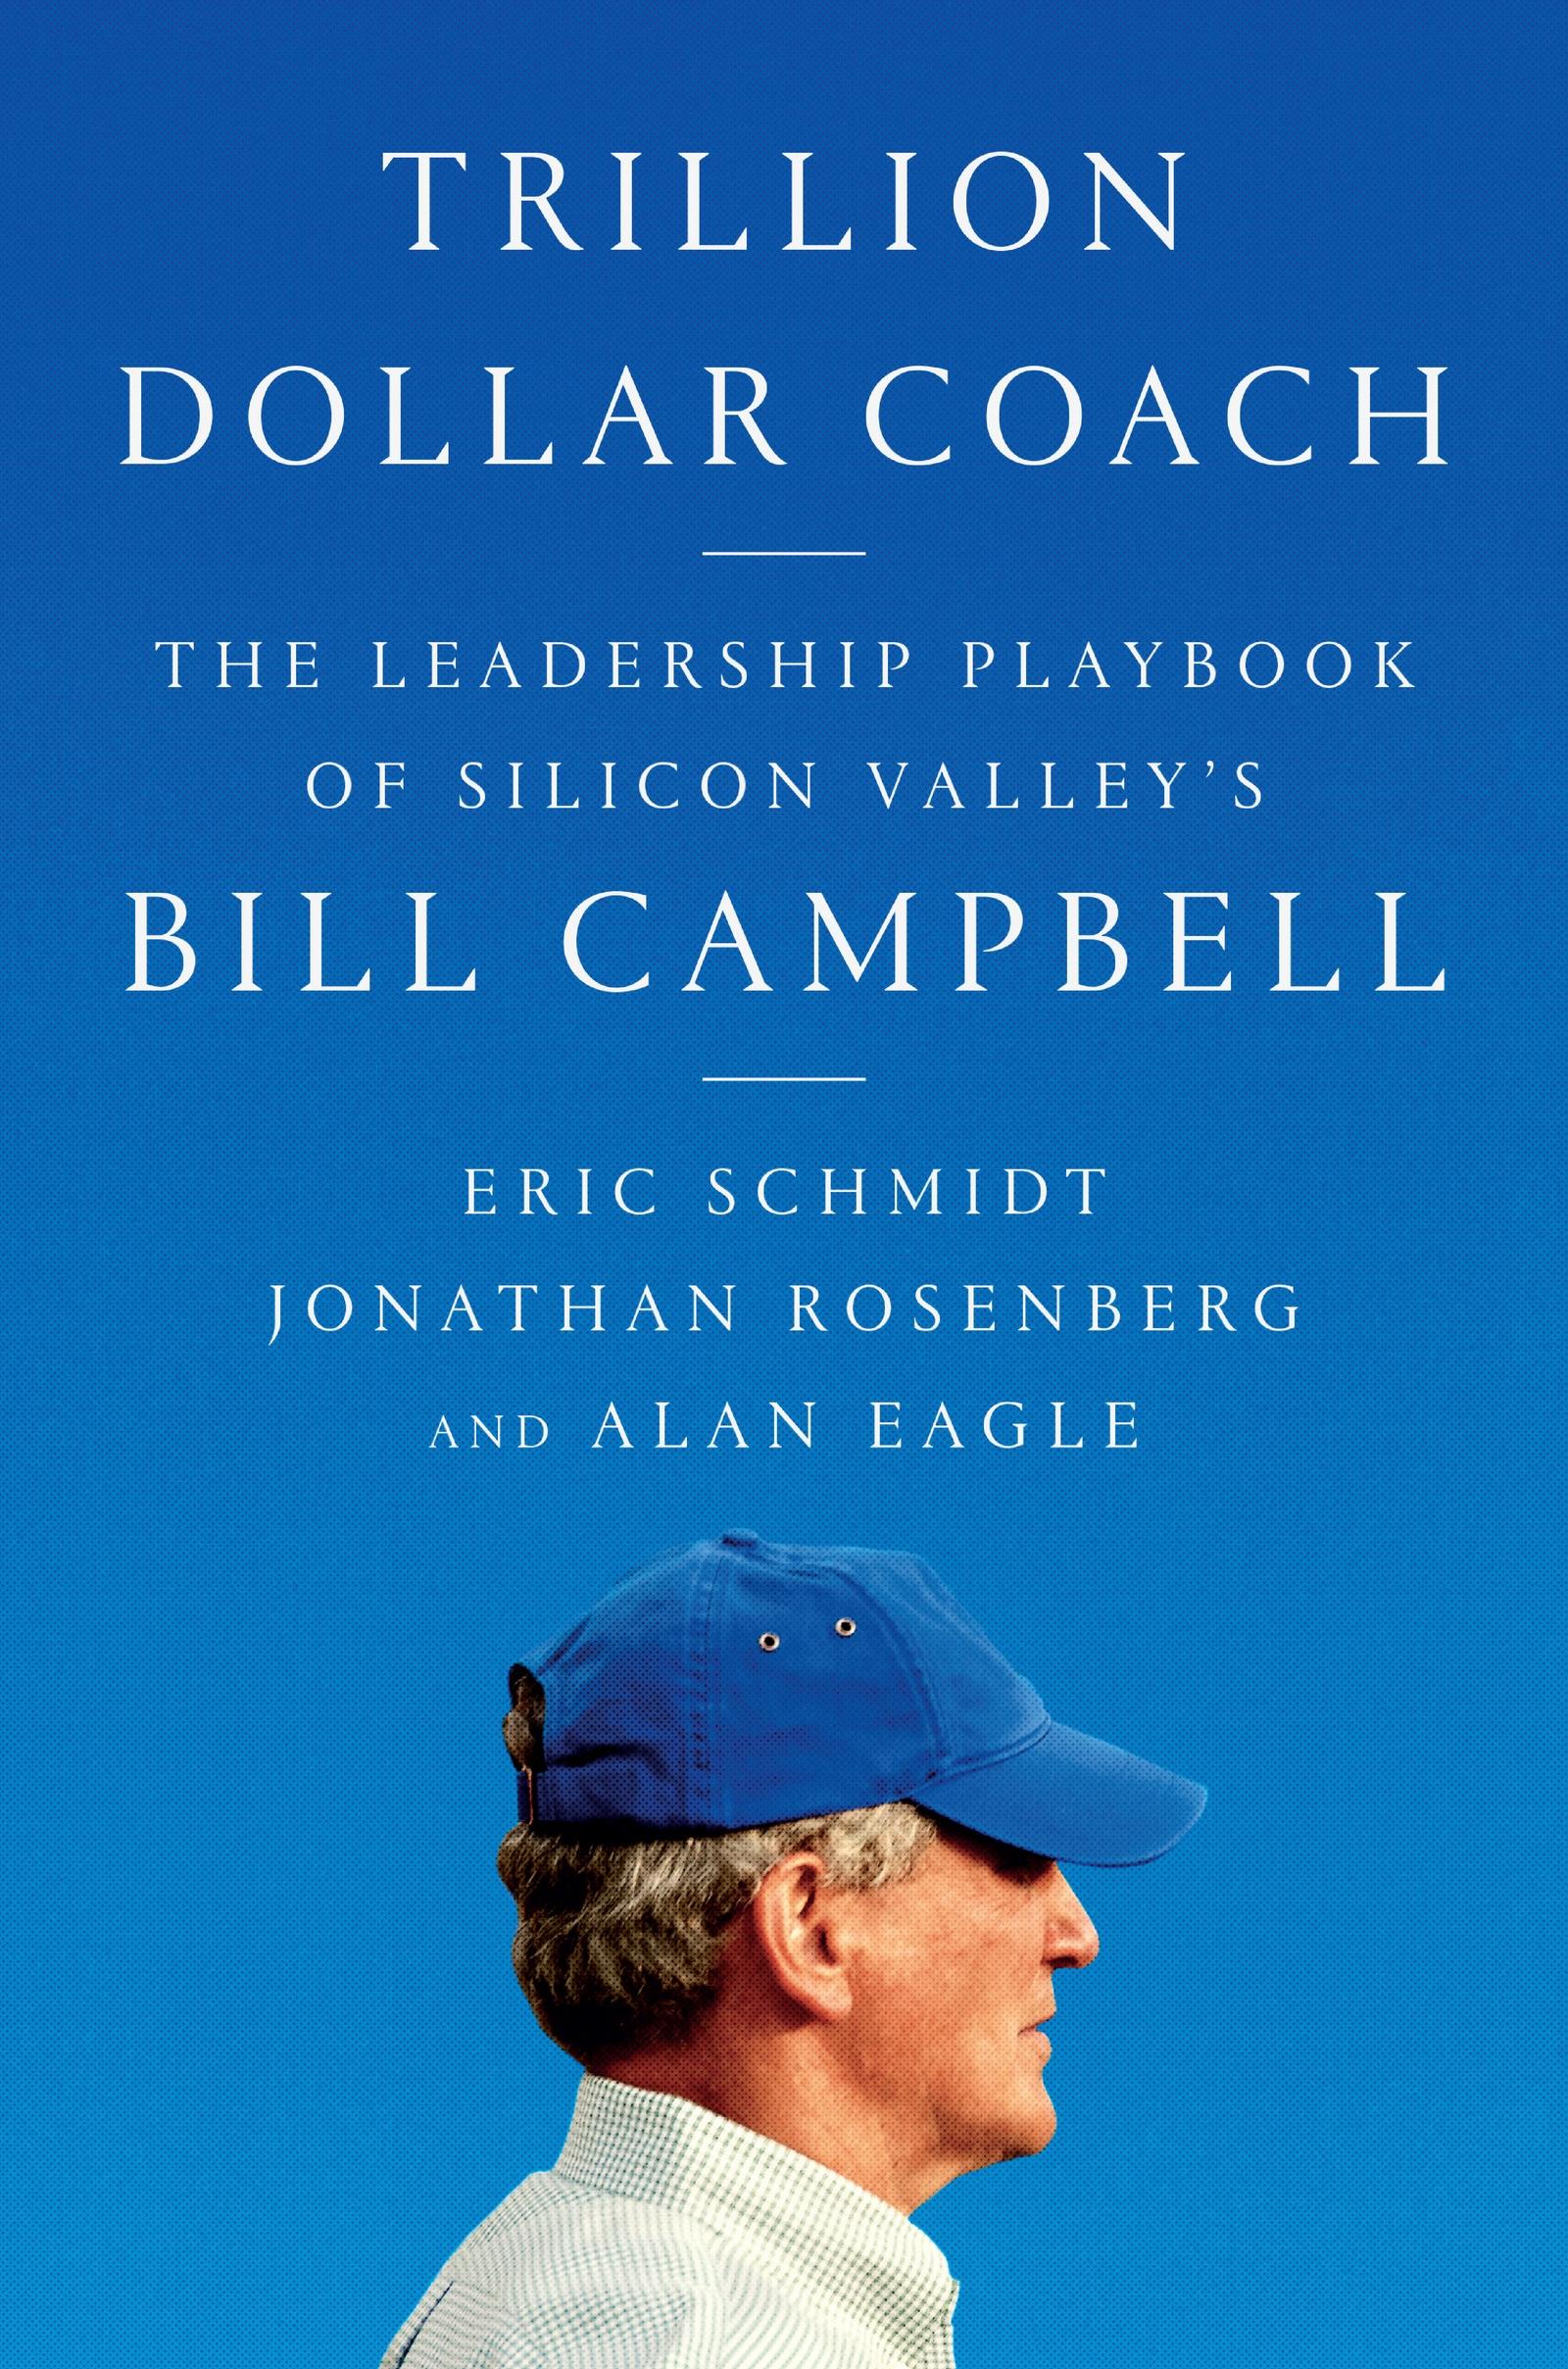 Book Cover of Trillion Dollar Coach